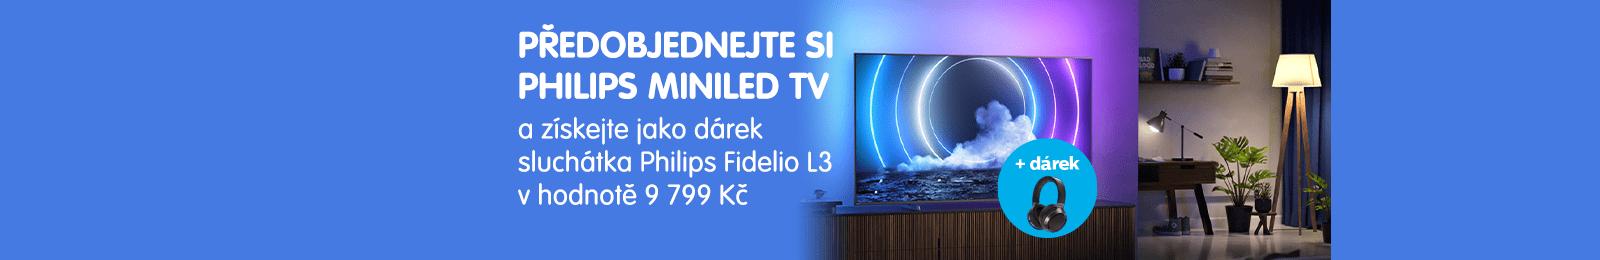 philips tv televize 2021 miniLED uhd 4K predobjednavka